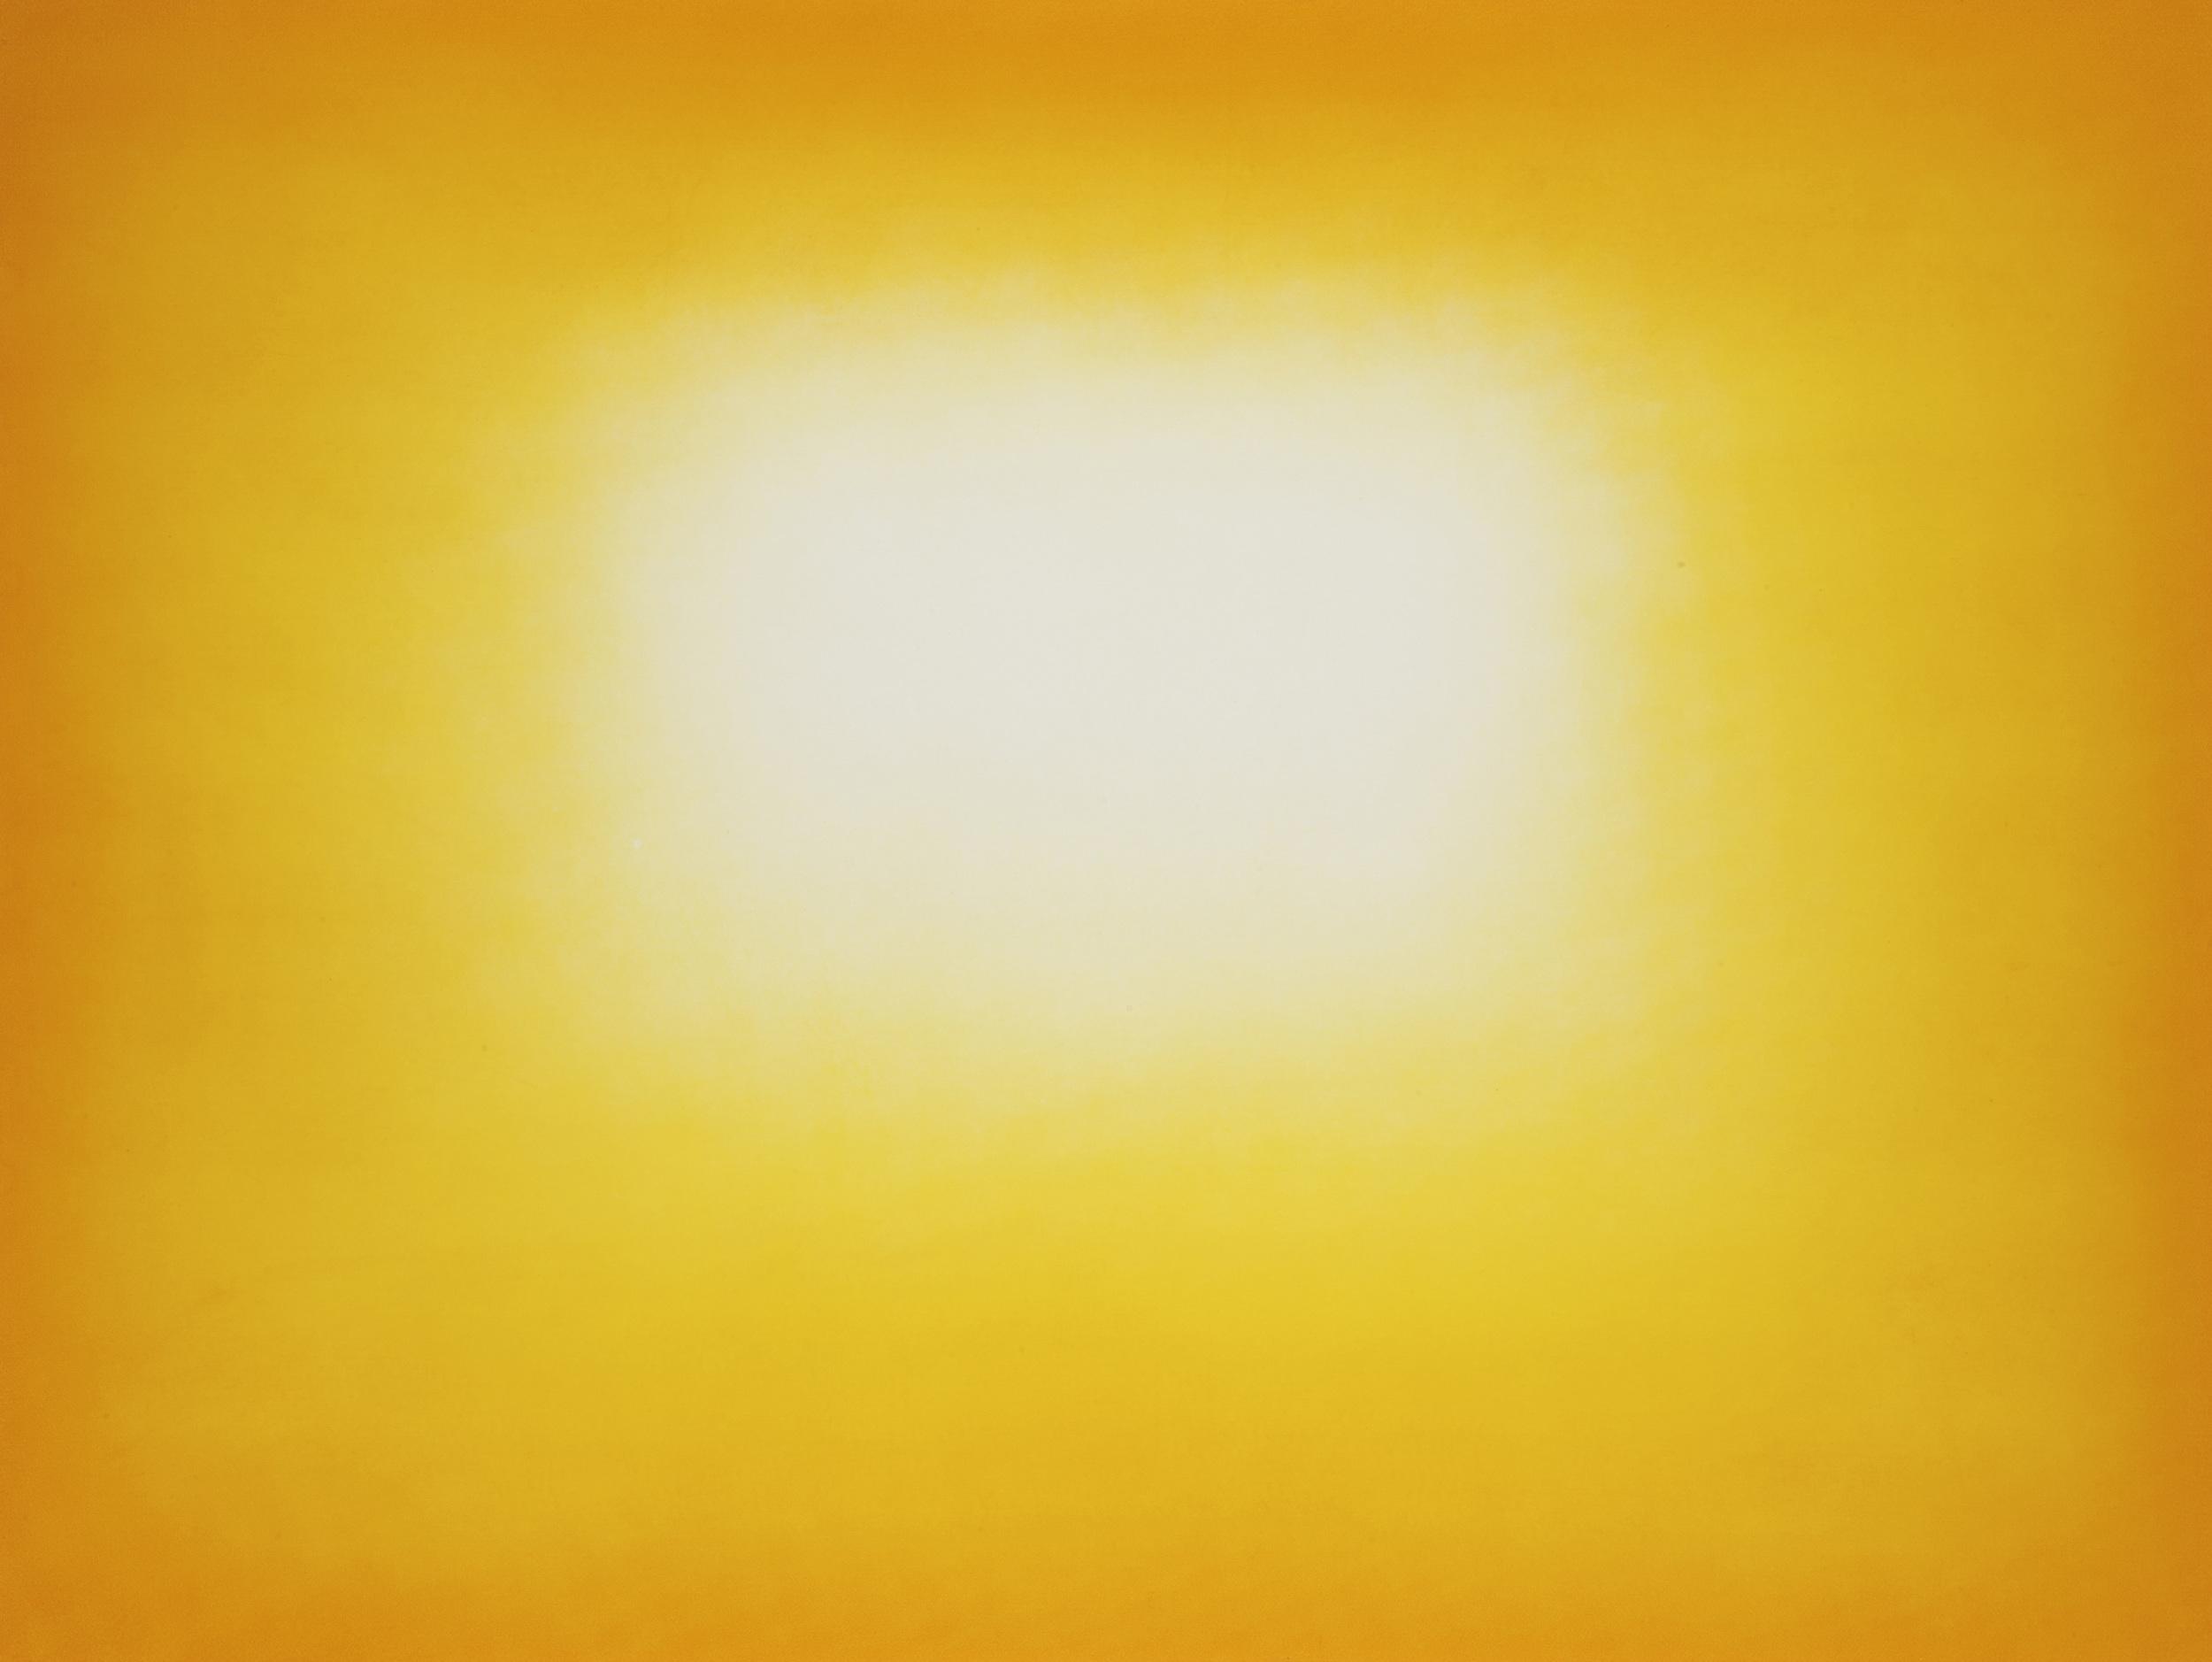 Anish Kapoor  Yellow • 2011 Gravura em metal Edição: 39 76.2 x 100 cm